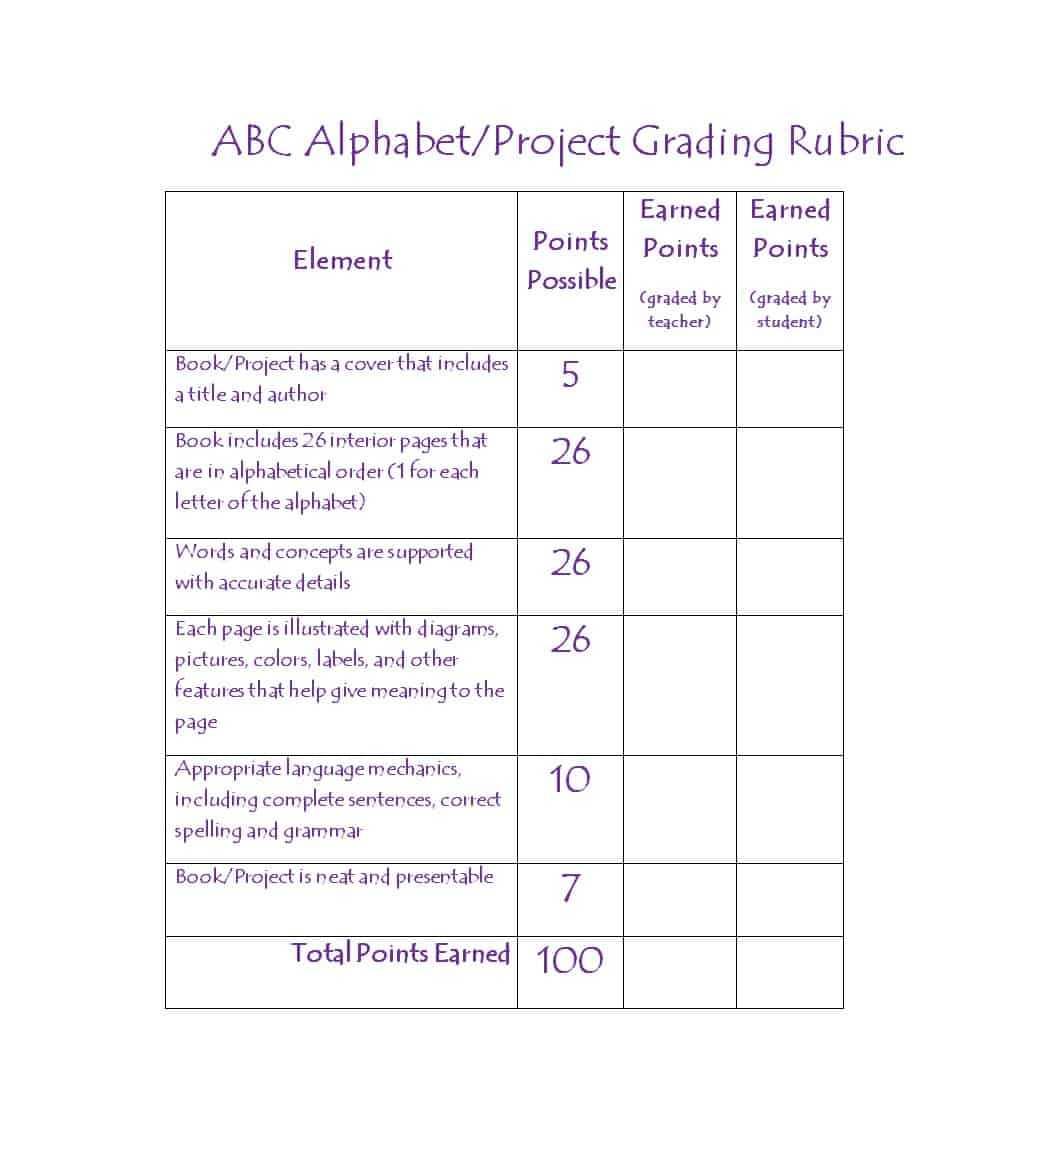 46 Editable Rubric Templates (Word Format) ᐅ Template Lab For Blank Rubric Template